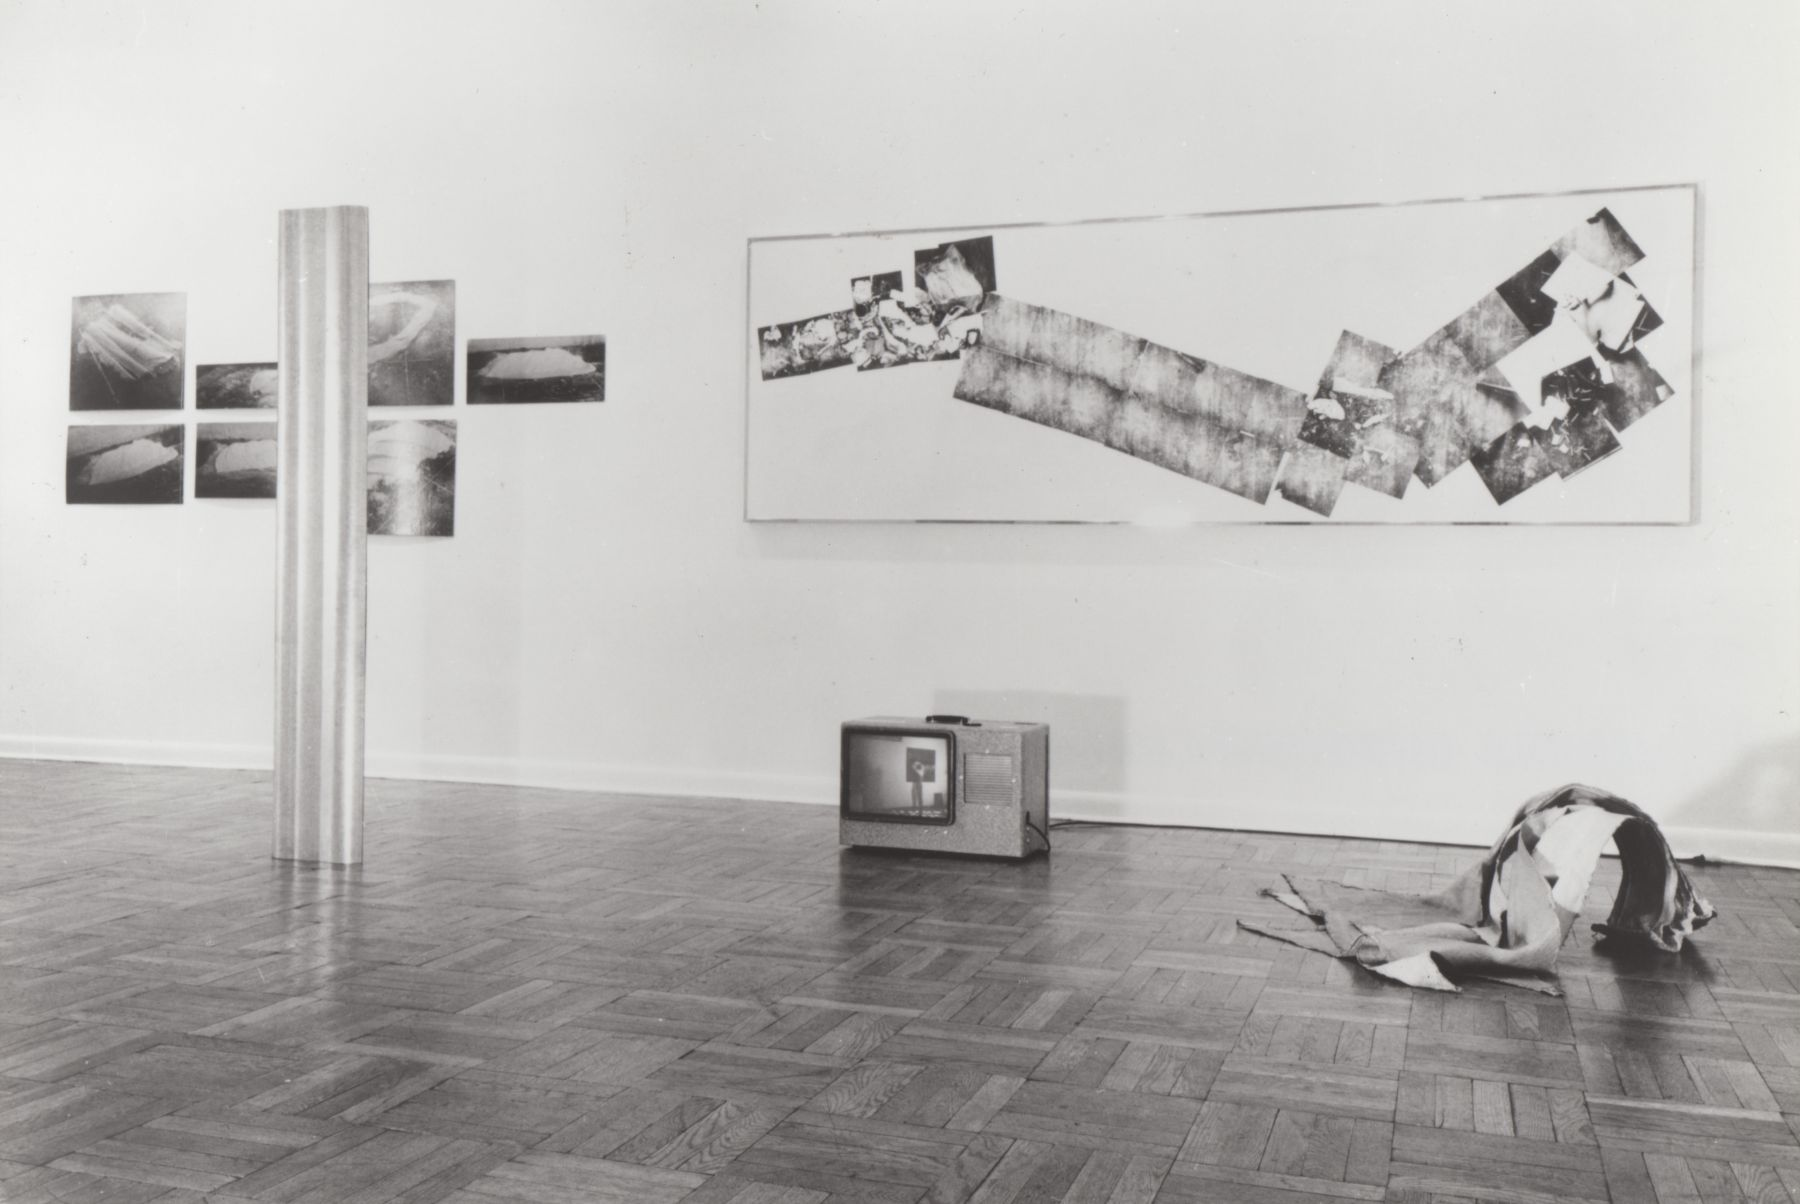 Installation view, Bruce Nauman, 4 EAST 77.